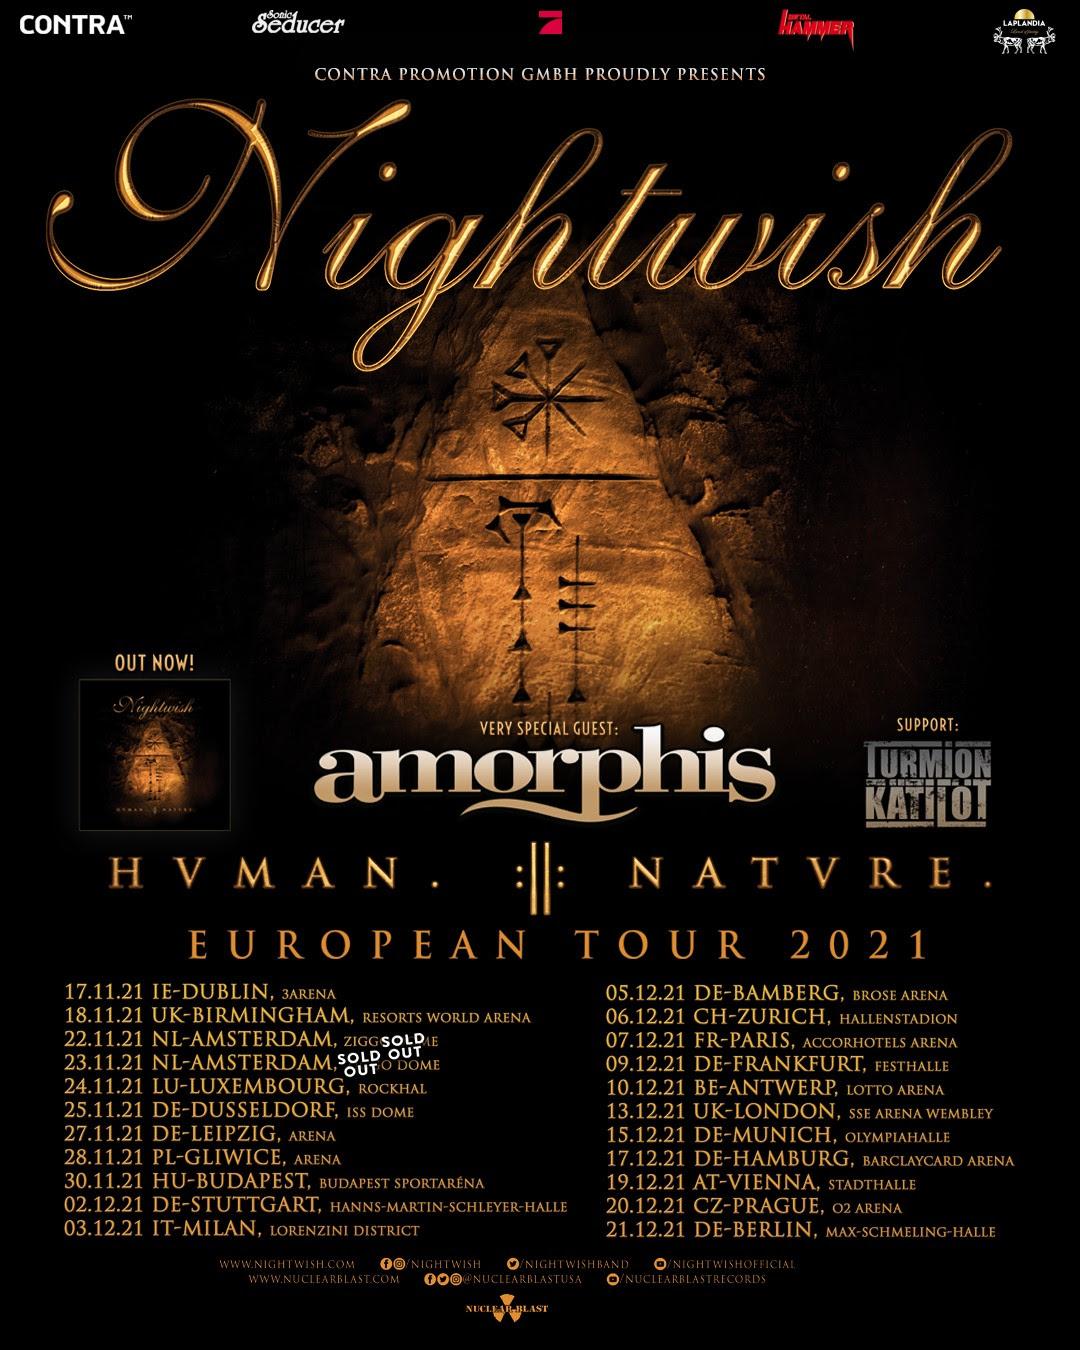 NIGHTWISH – posticipano il tour europeo!